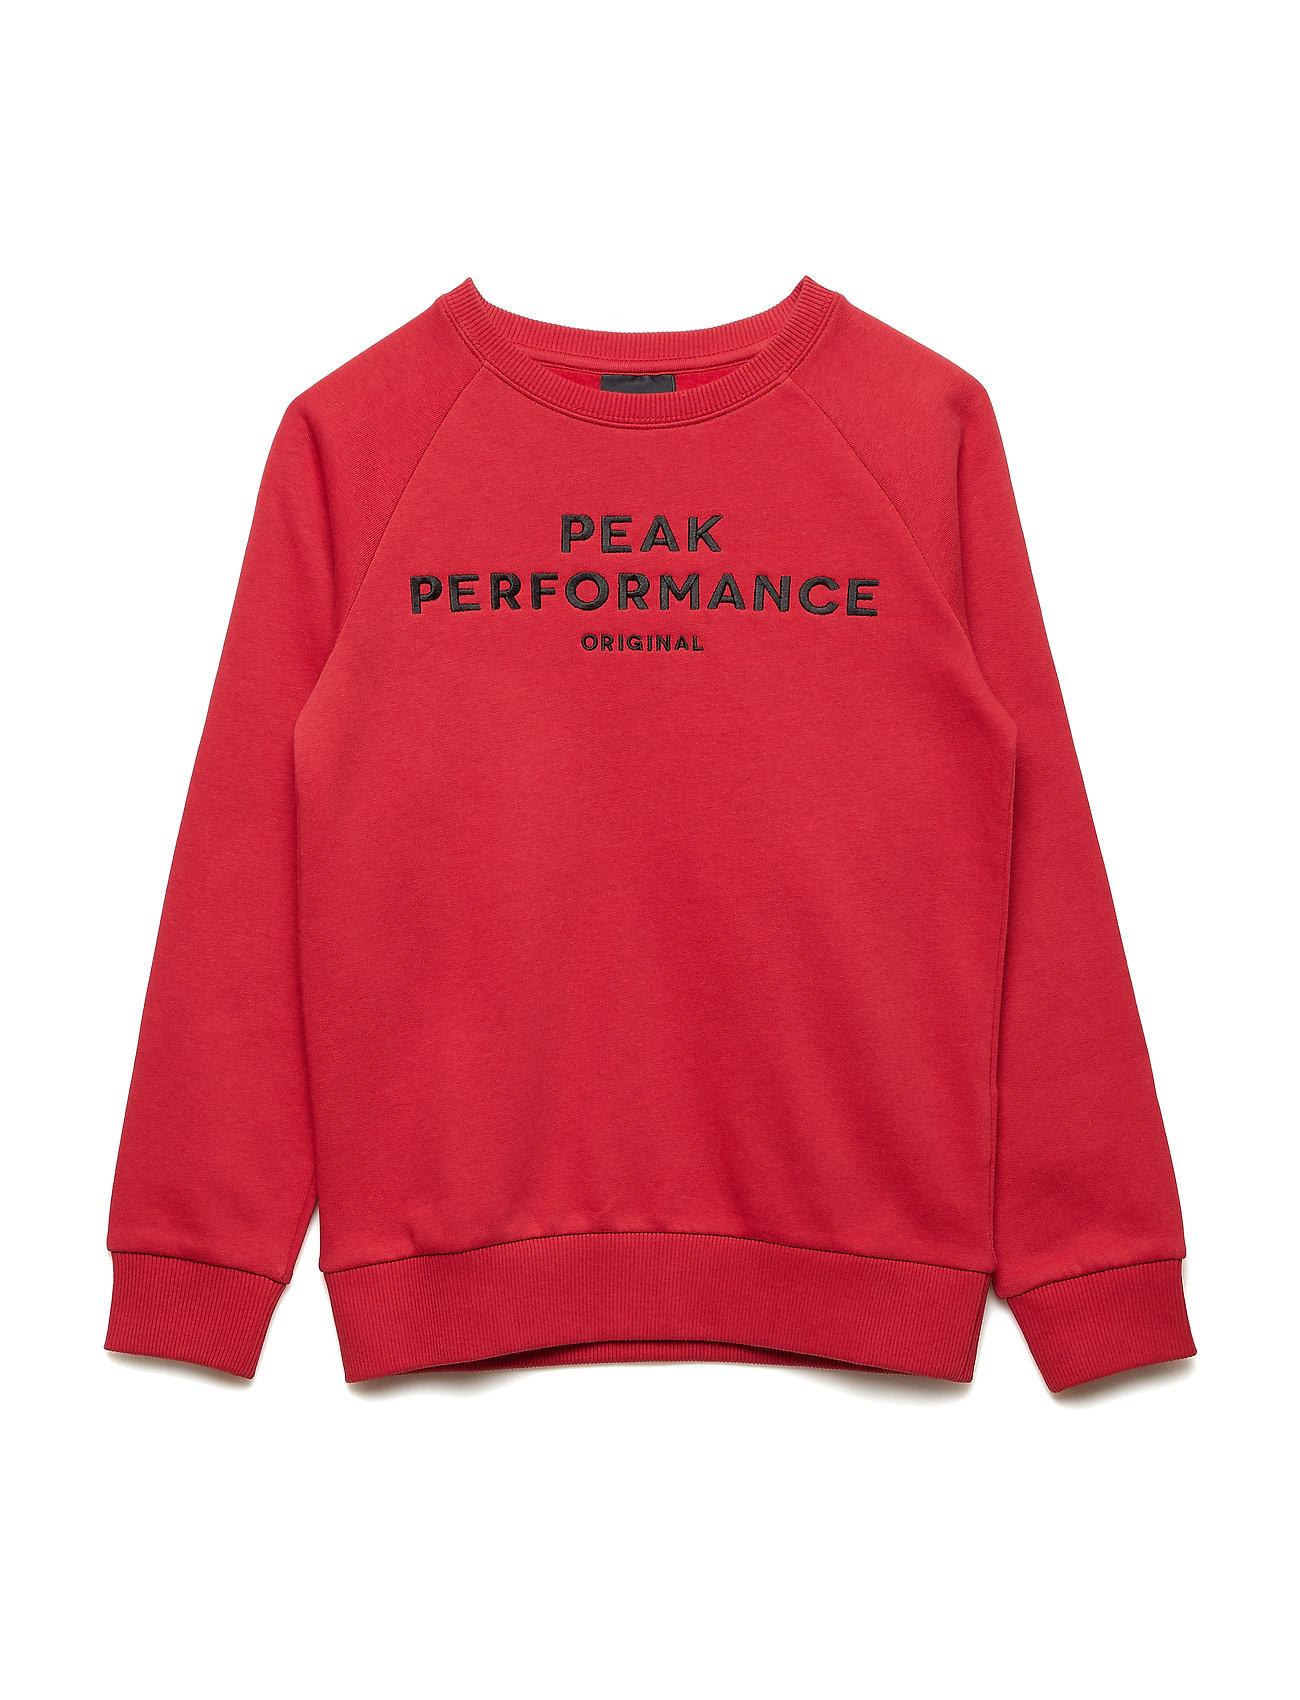 Peak Performance JR ORIGC